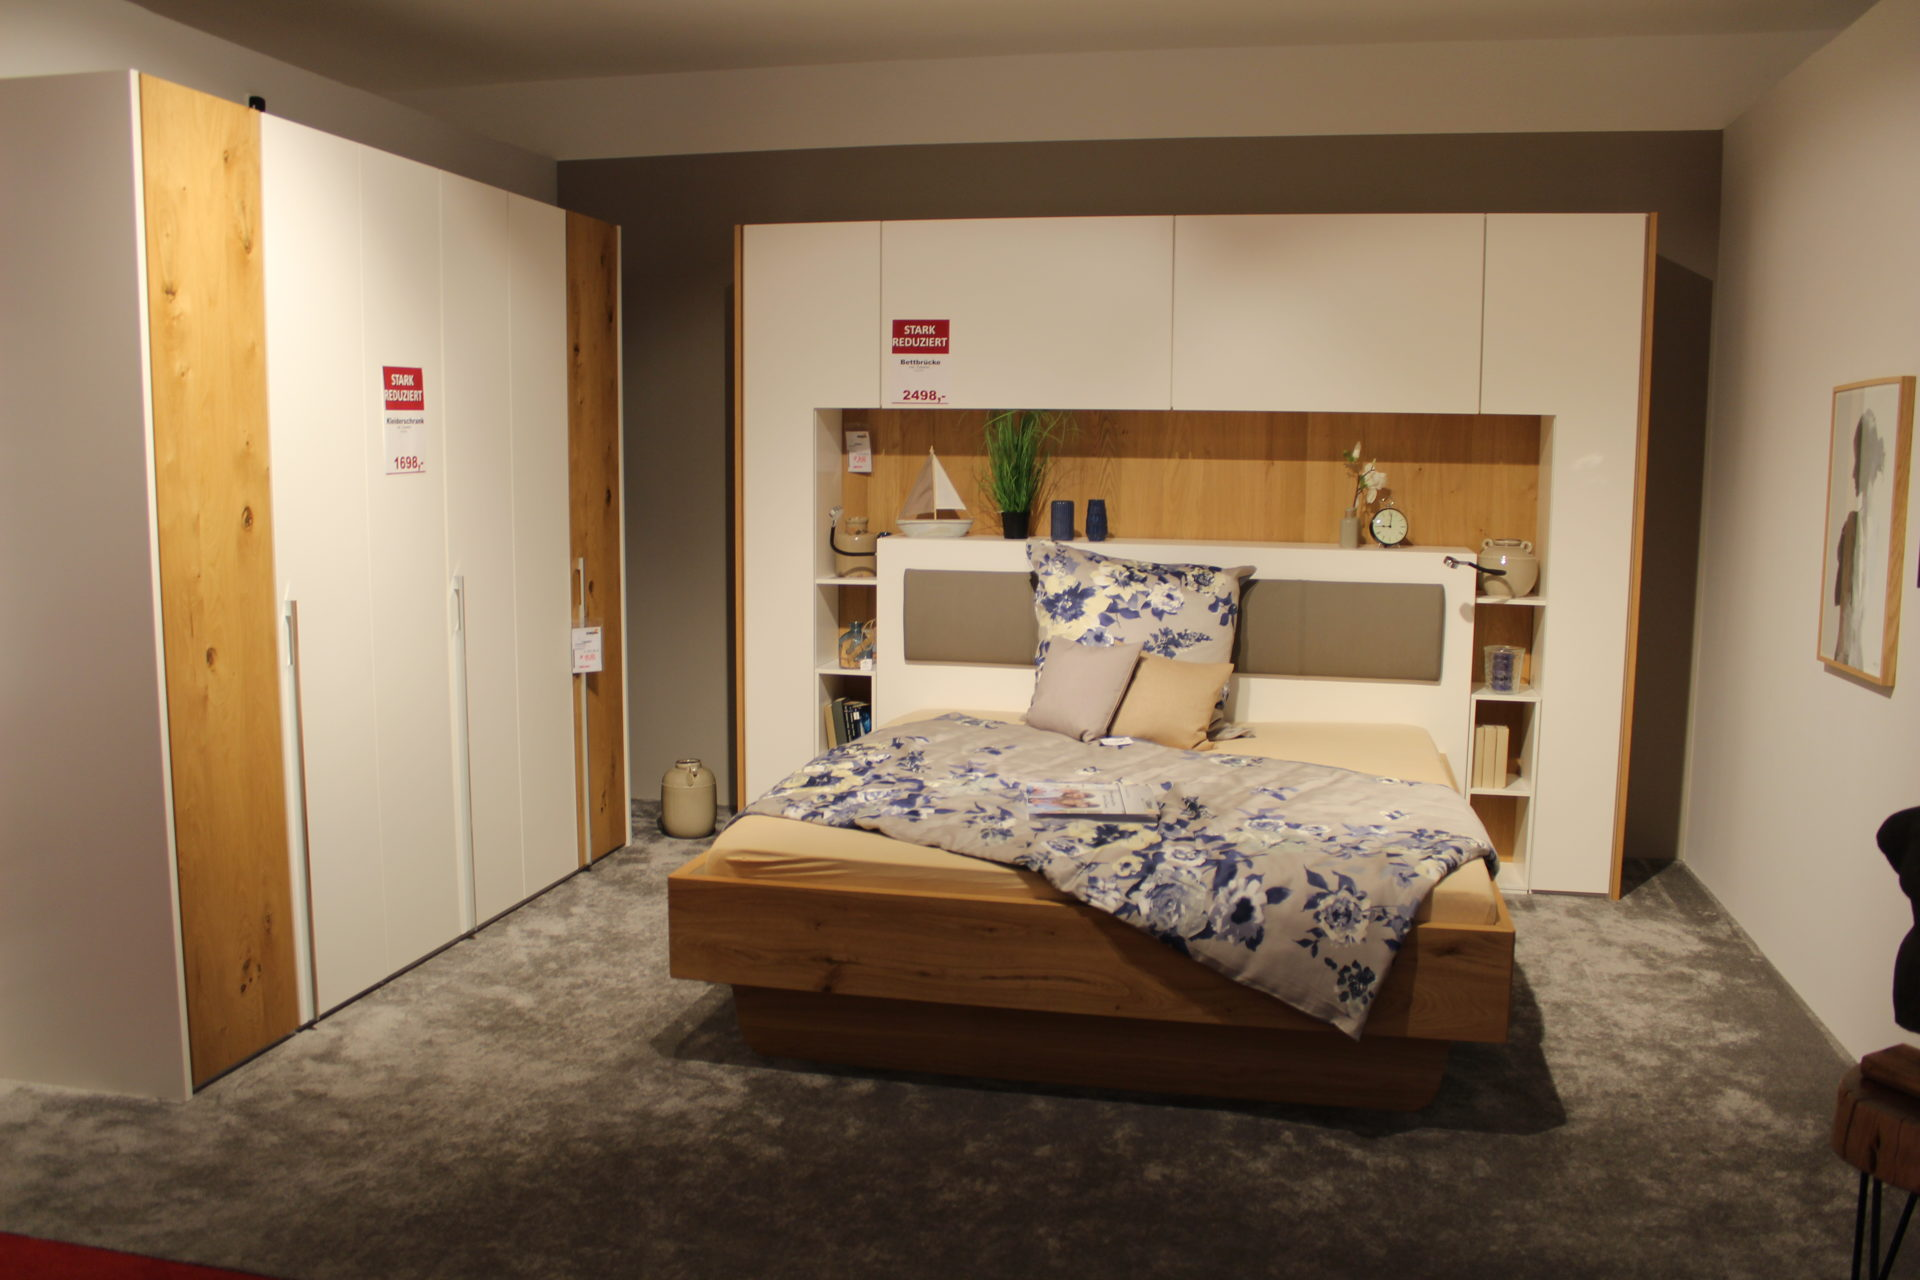 Möbel Eilers Apen, Räume, Schlafzimmer, Betten, Boxspringbett ...